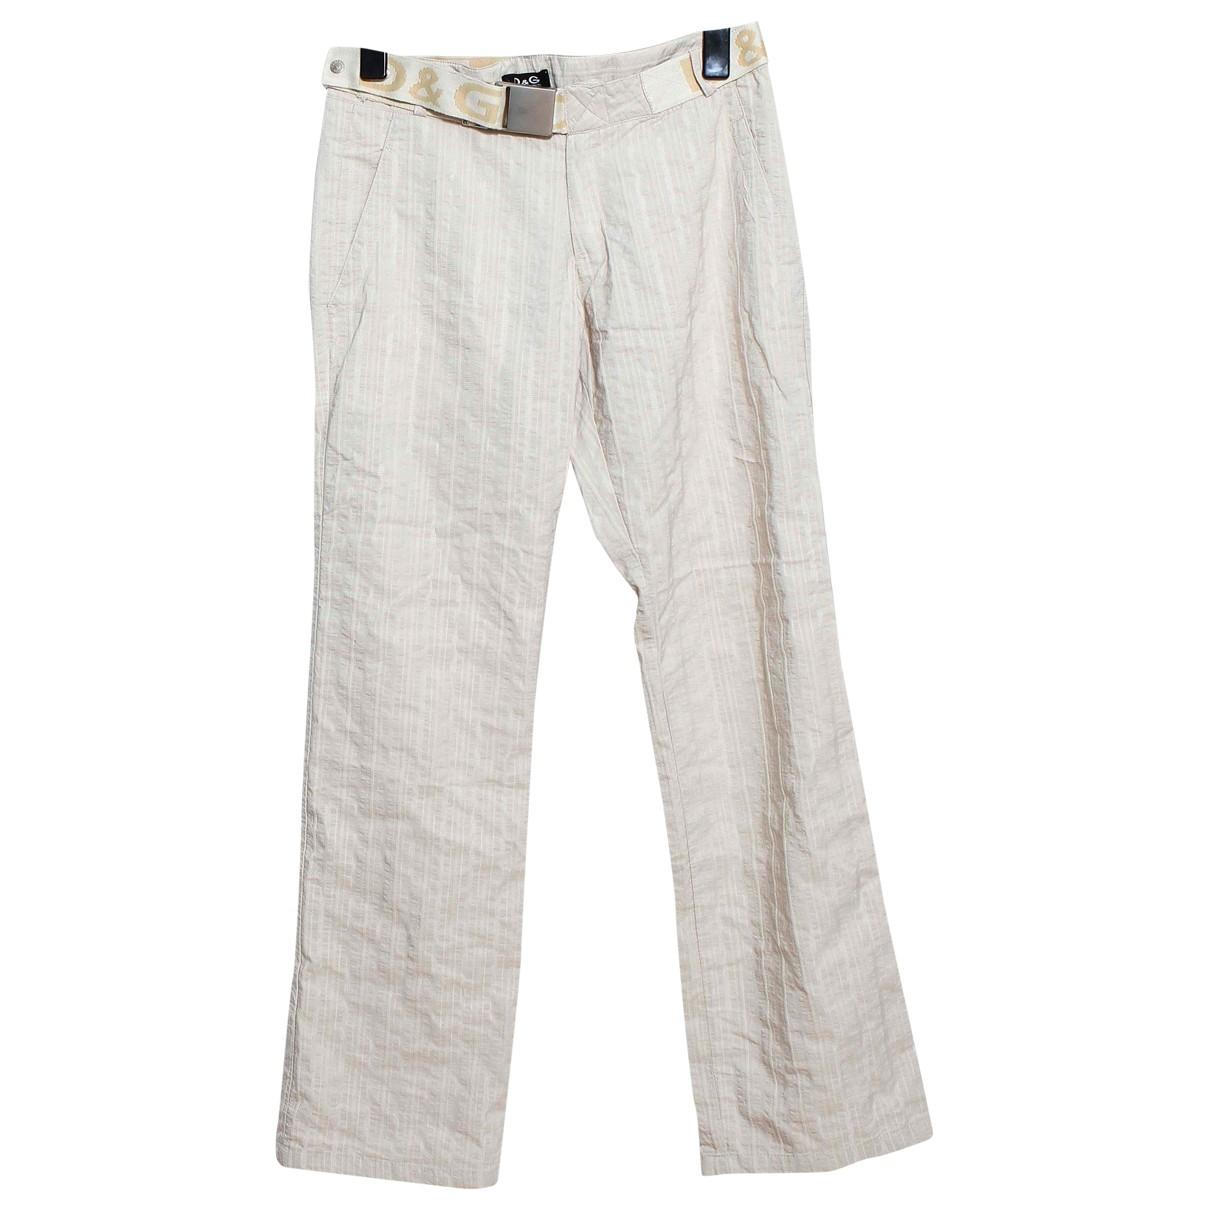 D&g \N Beige Cotton Trousers for Women 44 FR